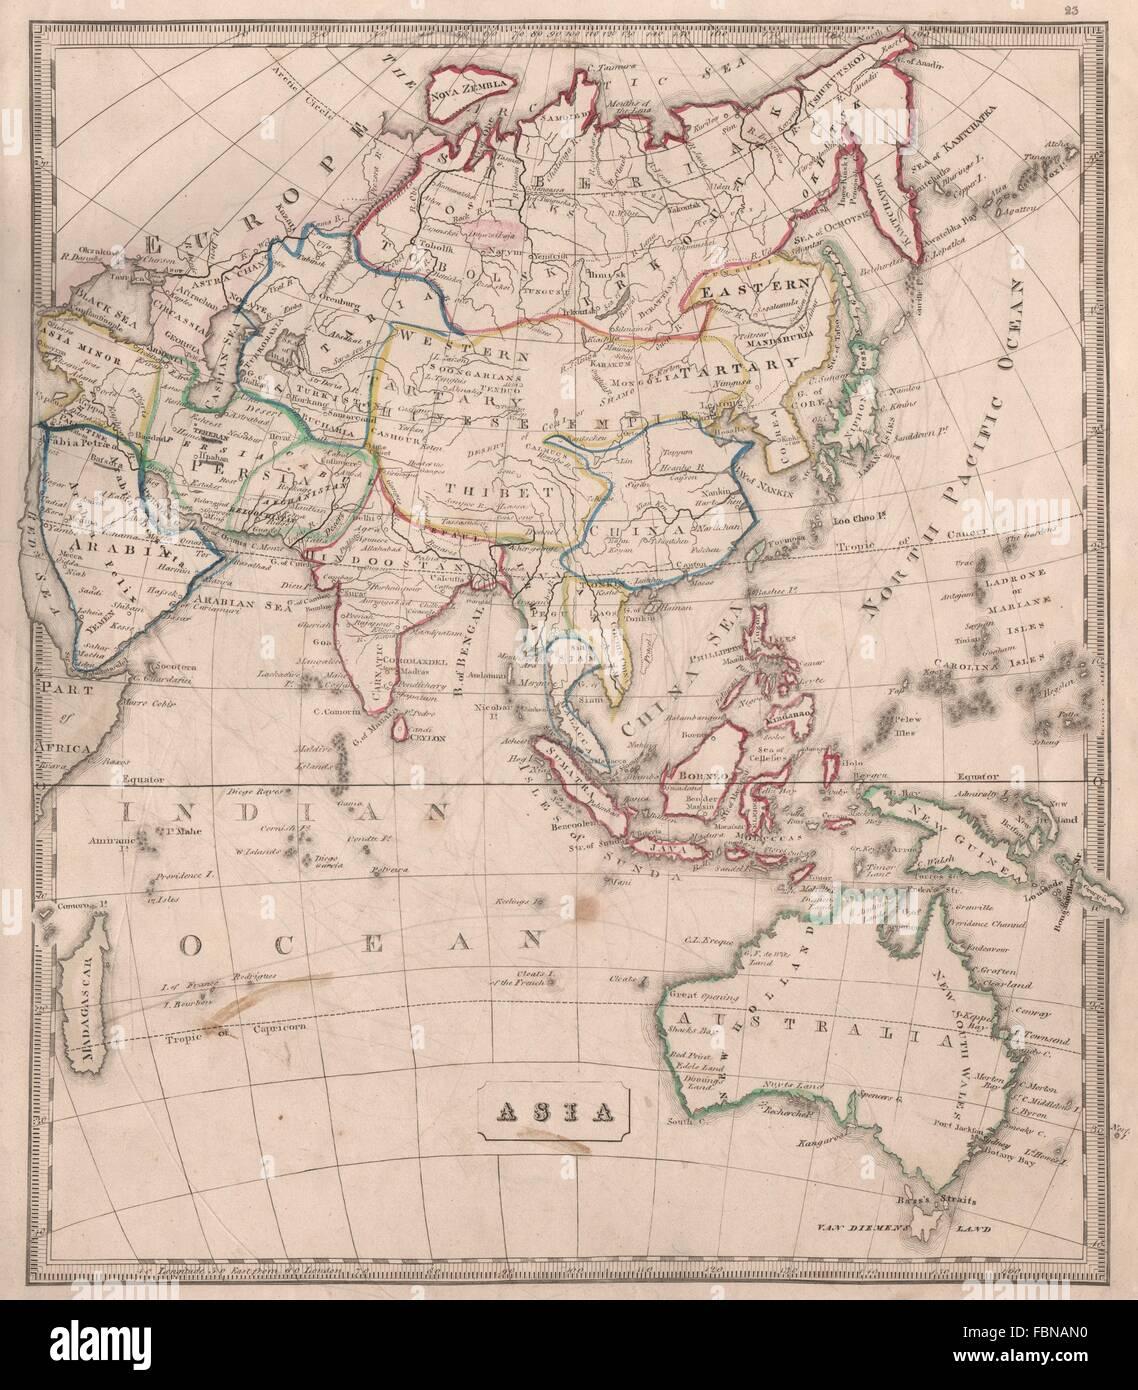 Asia W/ Great Wall Of China Tartary Siam Anam.sarawak Kingdom Weller 1862 Map